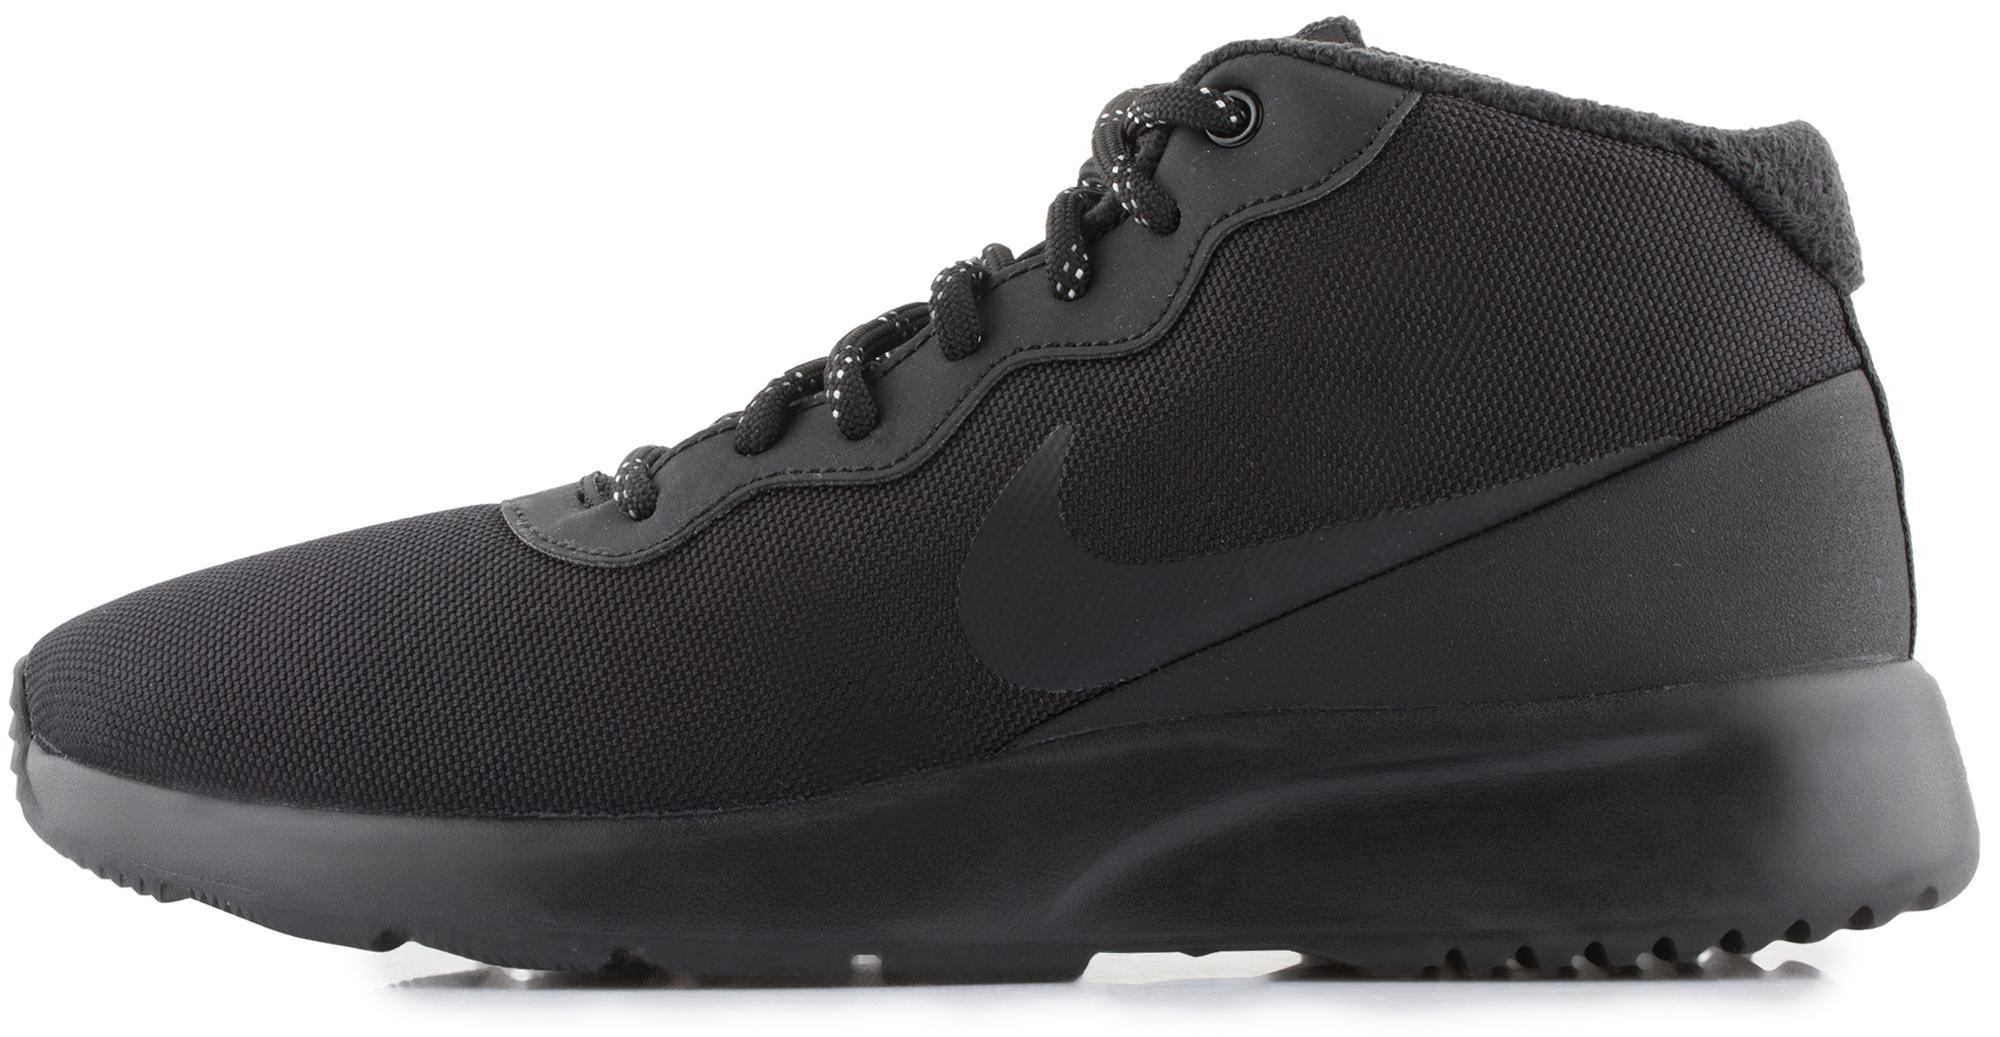 Nike Кроссовки мужские Tanjun Chukka, размер 46,5